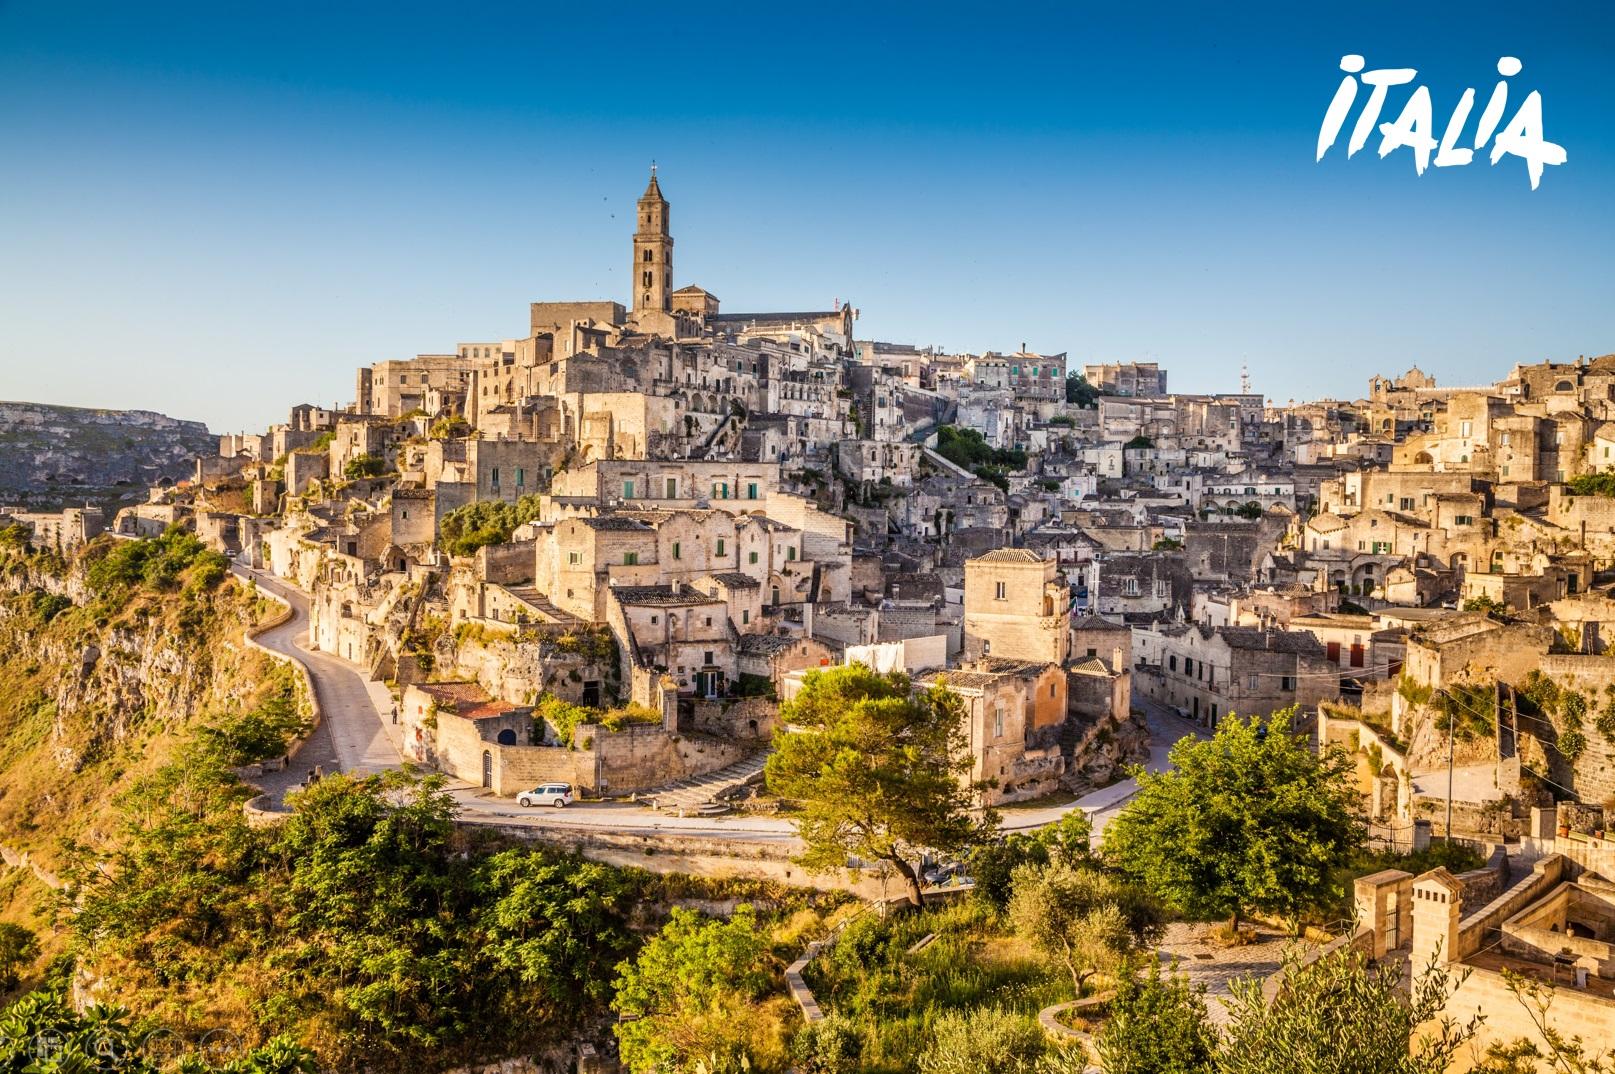 Italien, let's meet here! Image 3